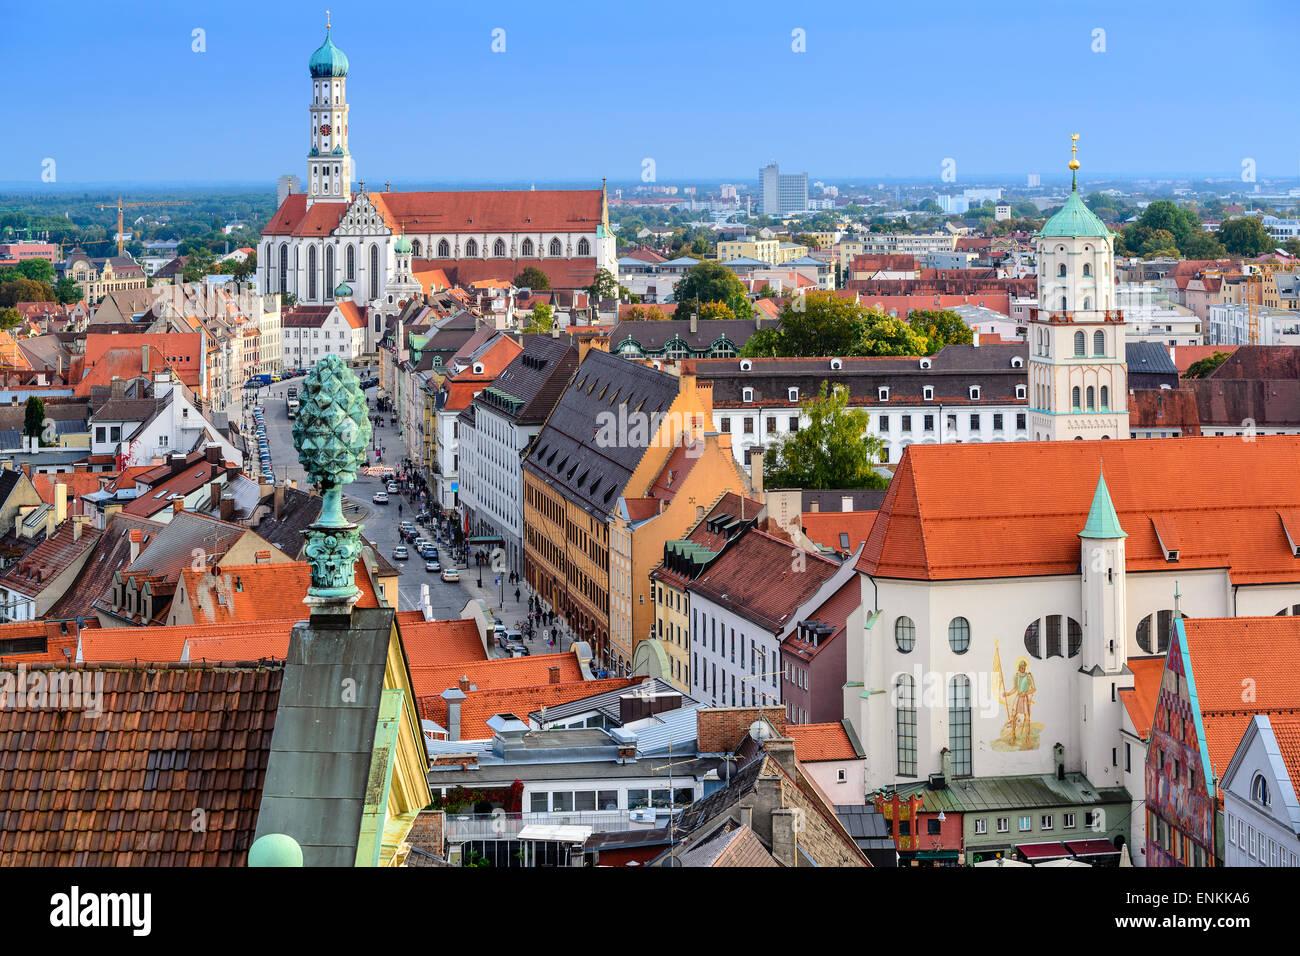 Augsburg, Germania città vecchia skyline. Immagini Stock